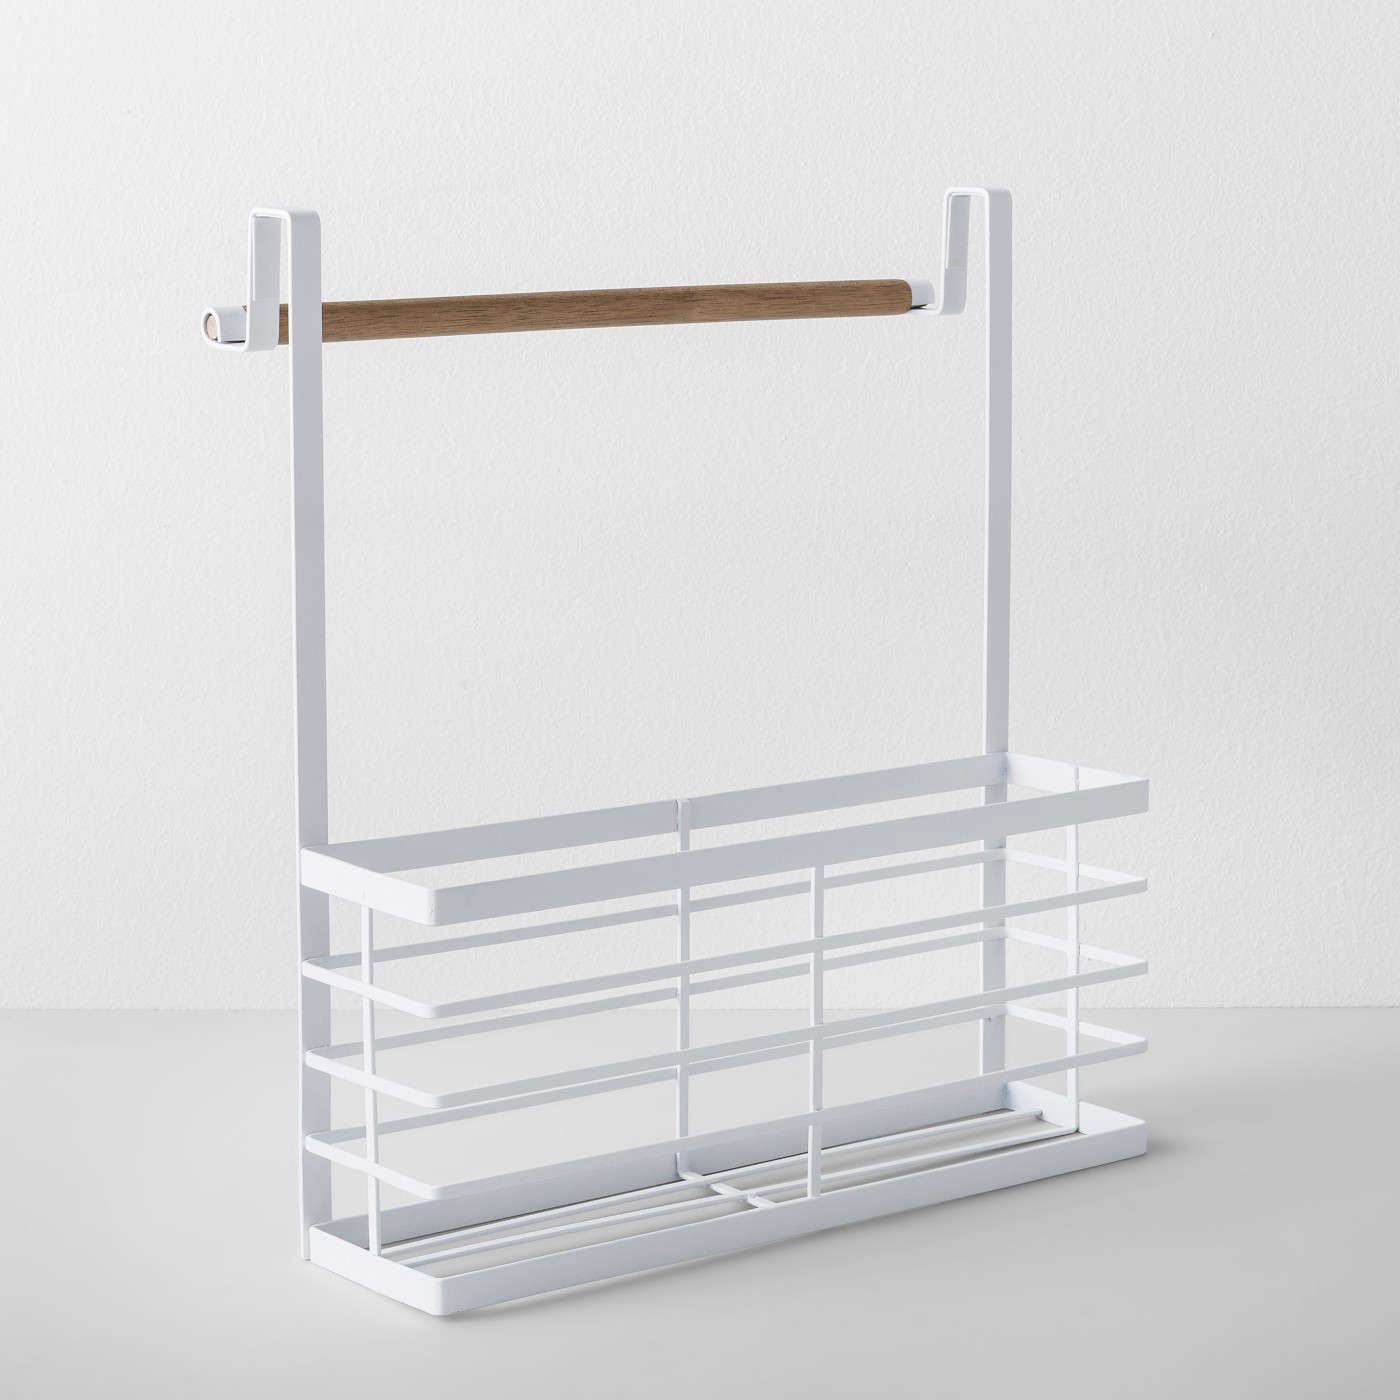 target 39 s new line of minimalist home goods made by design. Black Bedroom Furniture Sets. Home Design Ideas